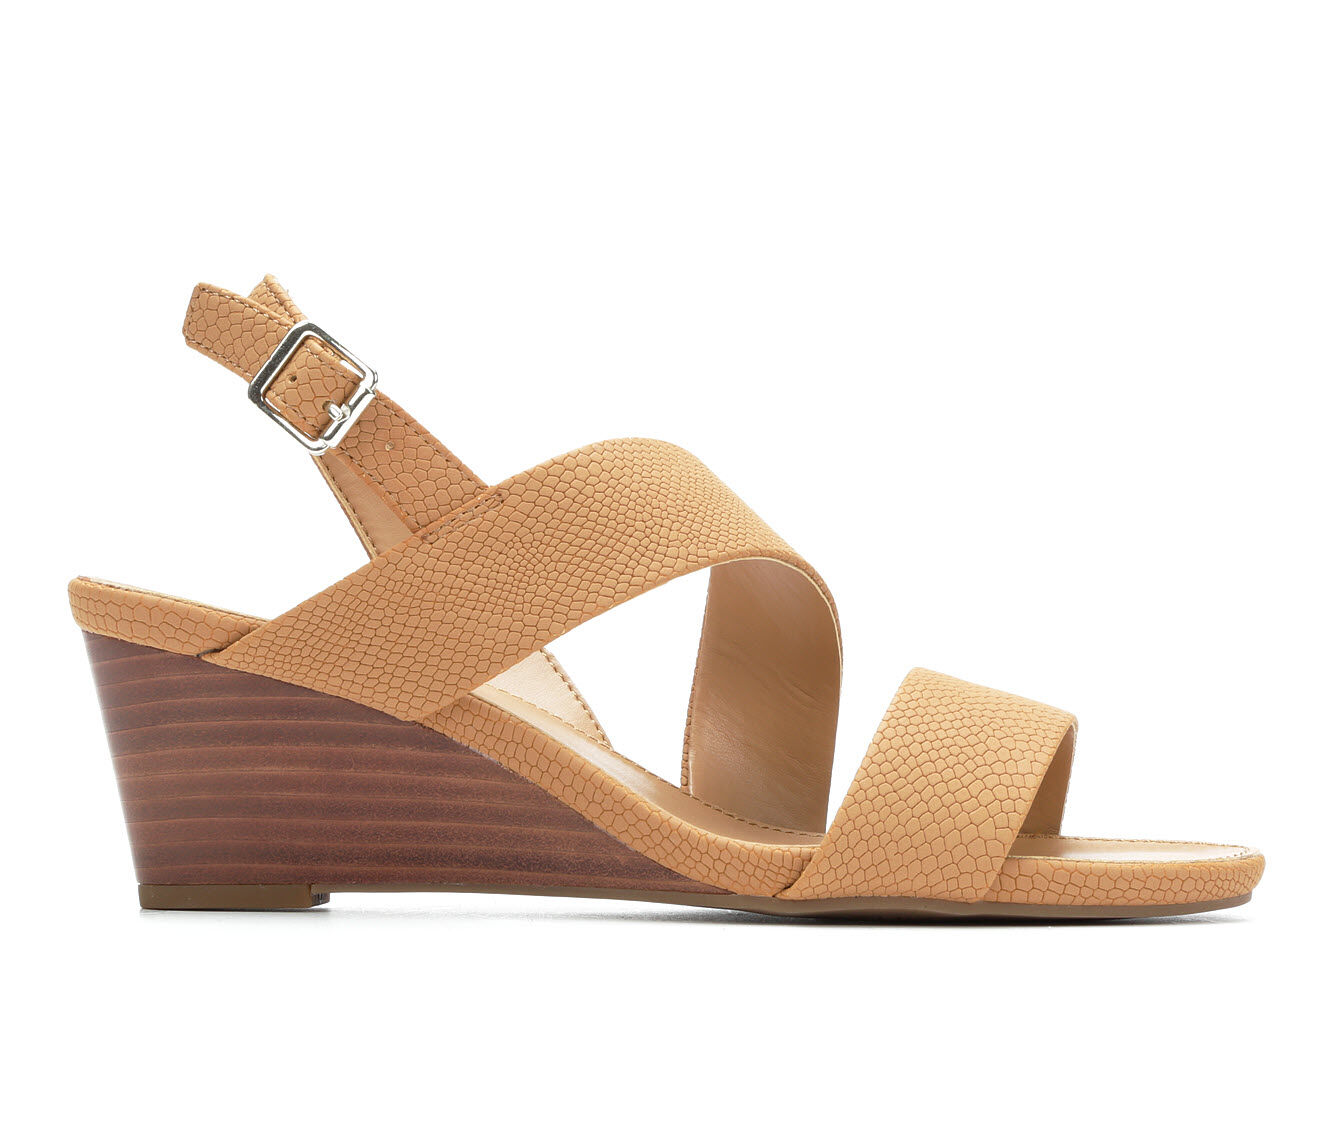 new style Women's Franco Sarto Danila2 Dress Sandals Havana